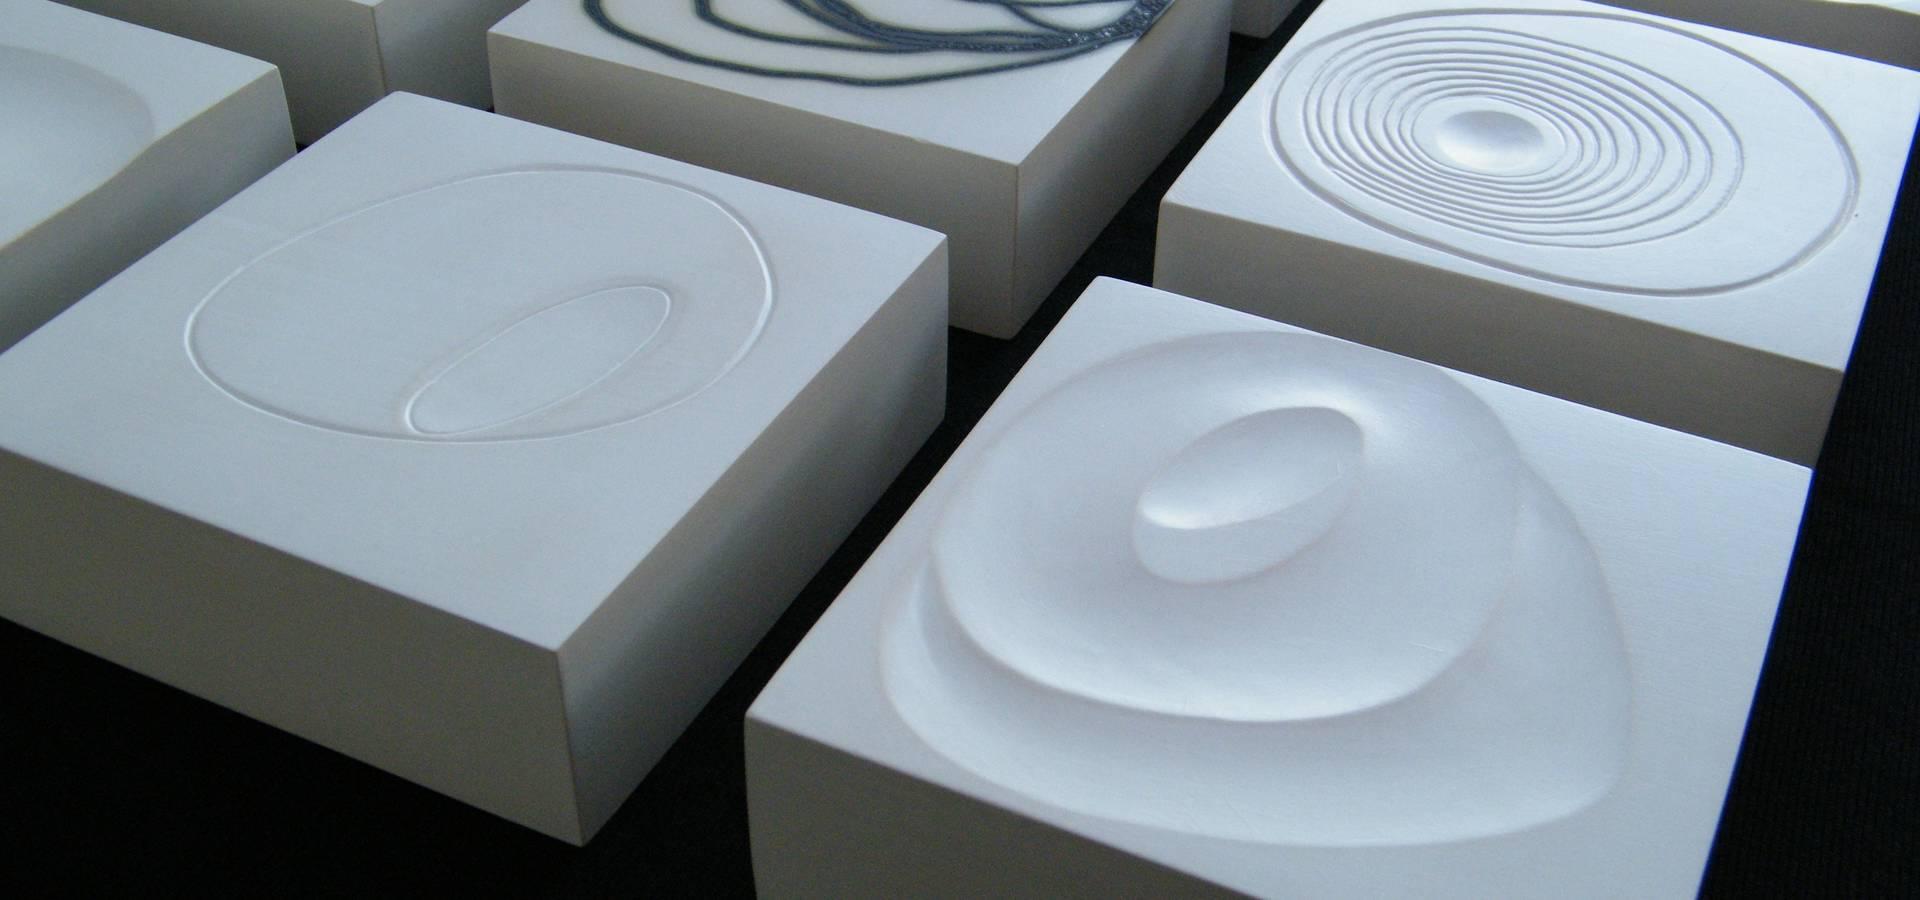 Marc Verbruggen – ceramic art